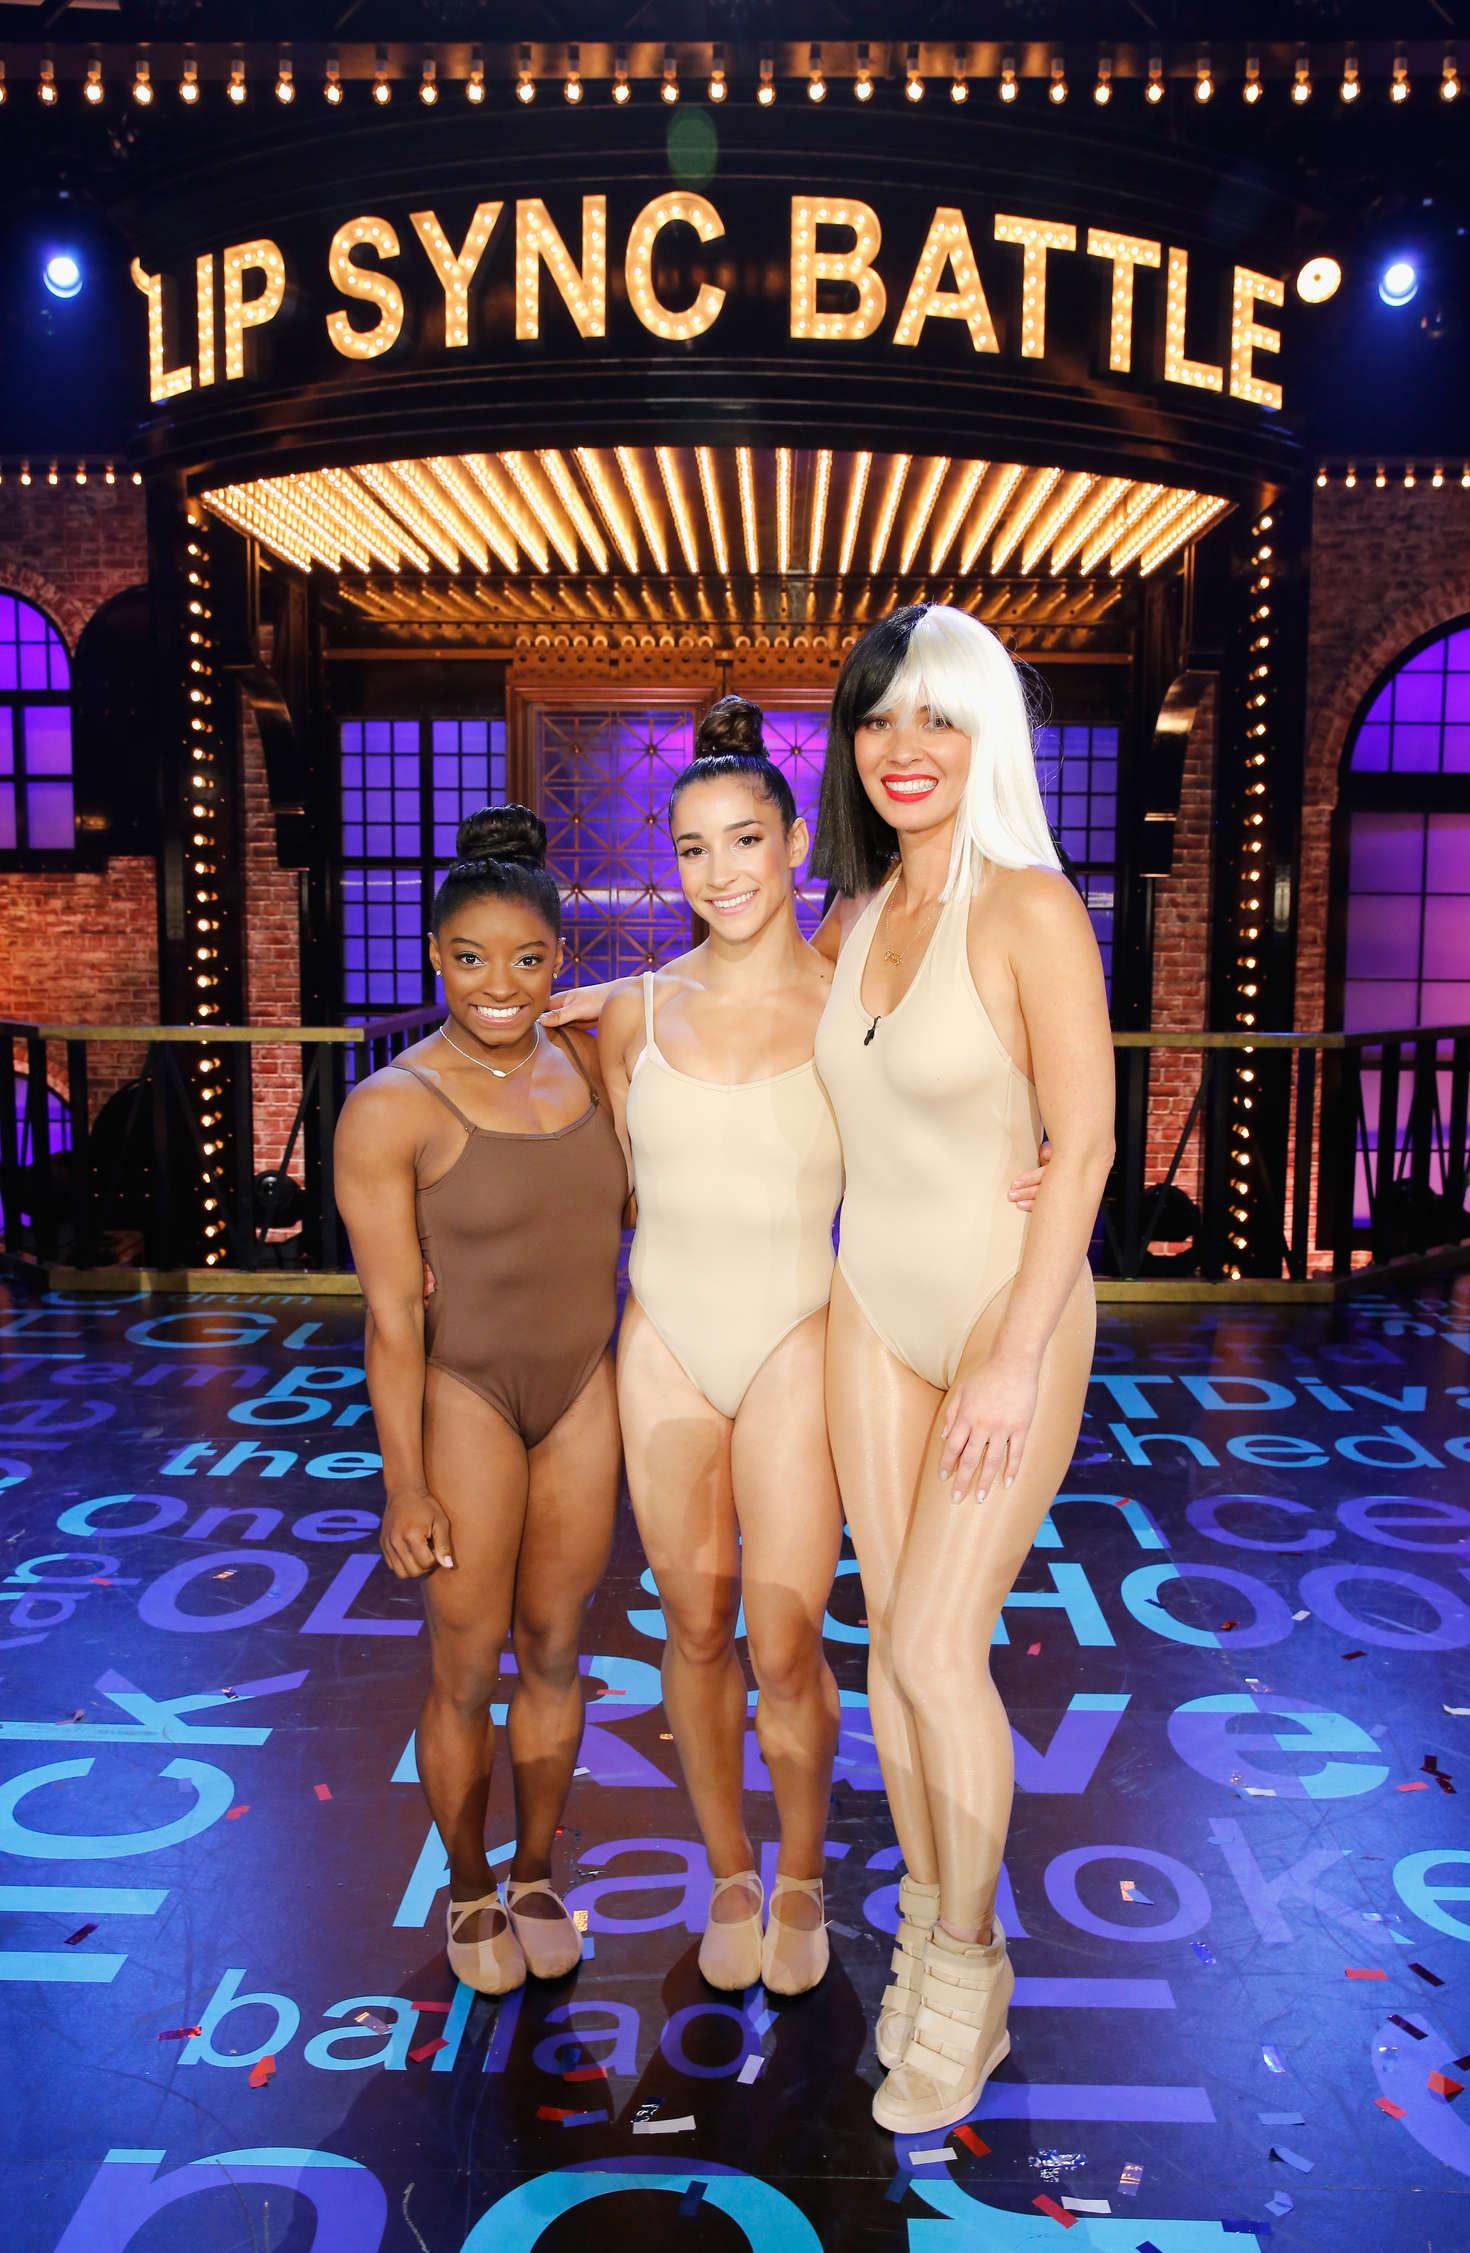 Olivia Munn, Aly Raisman and Simone Biles - Lip Sync Battle All-Stars Live